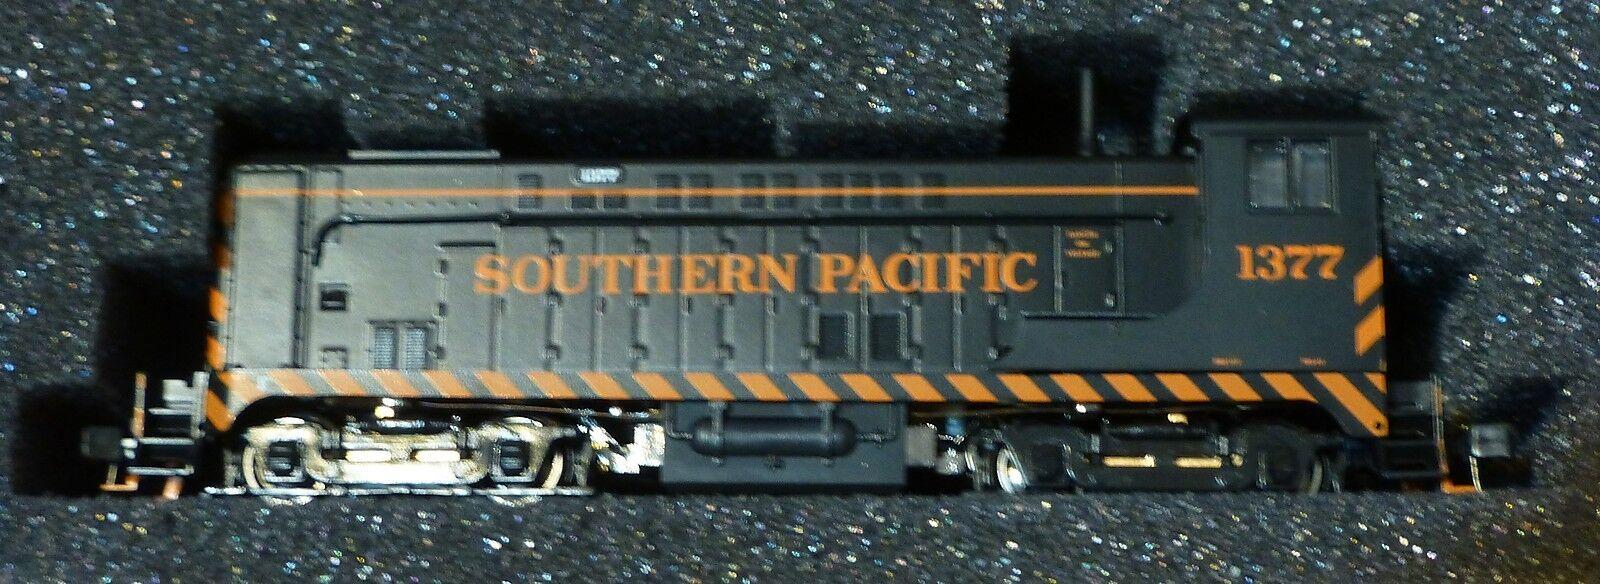 Atlas N   50014 Baldwin vo1000 w step guardias estándar Dc Southern Pacific   1377